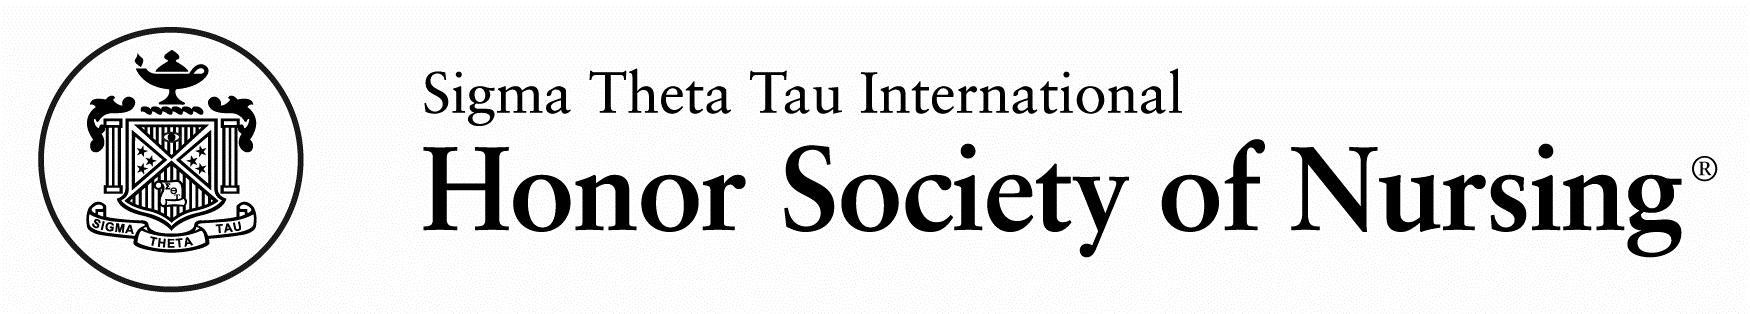 STTI logo